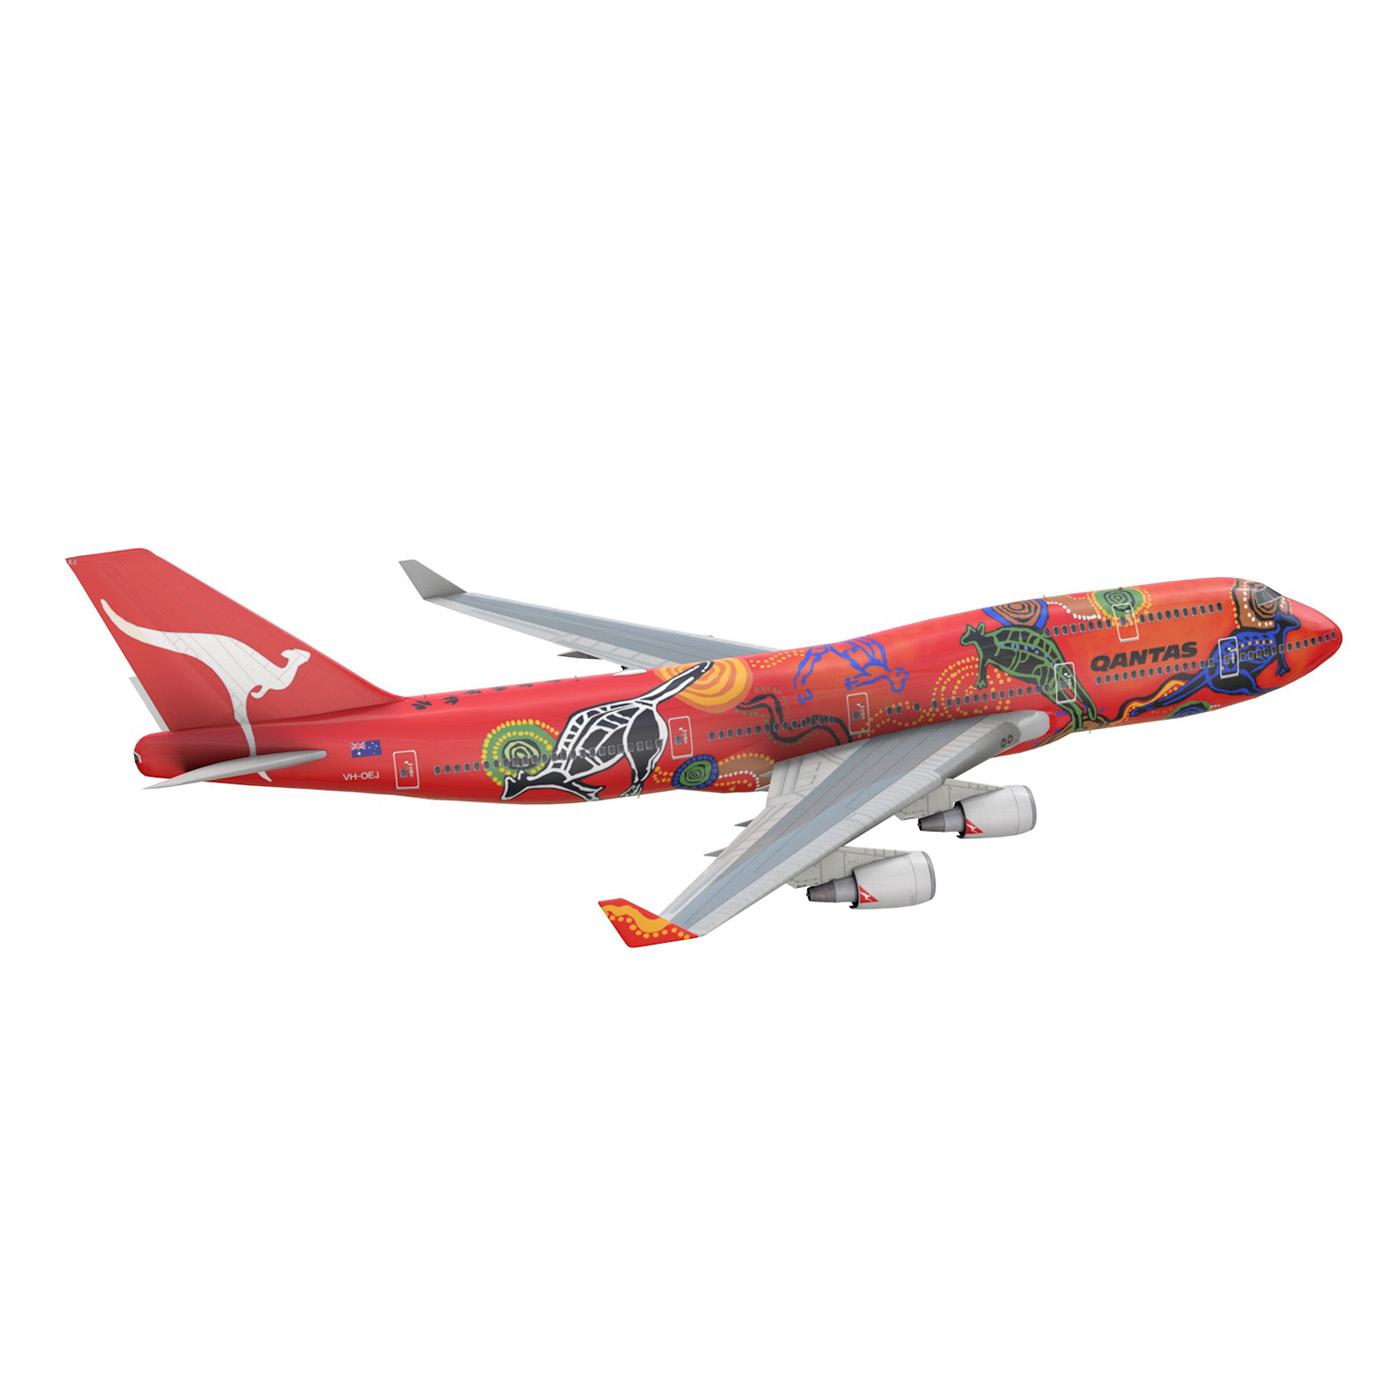 boeing 747 qantas wunala dreaming 3d model 3ds fbx c4d lwo obj 281785